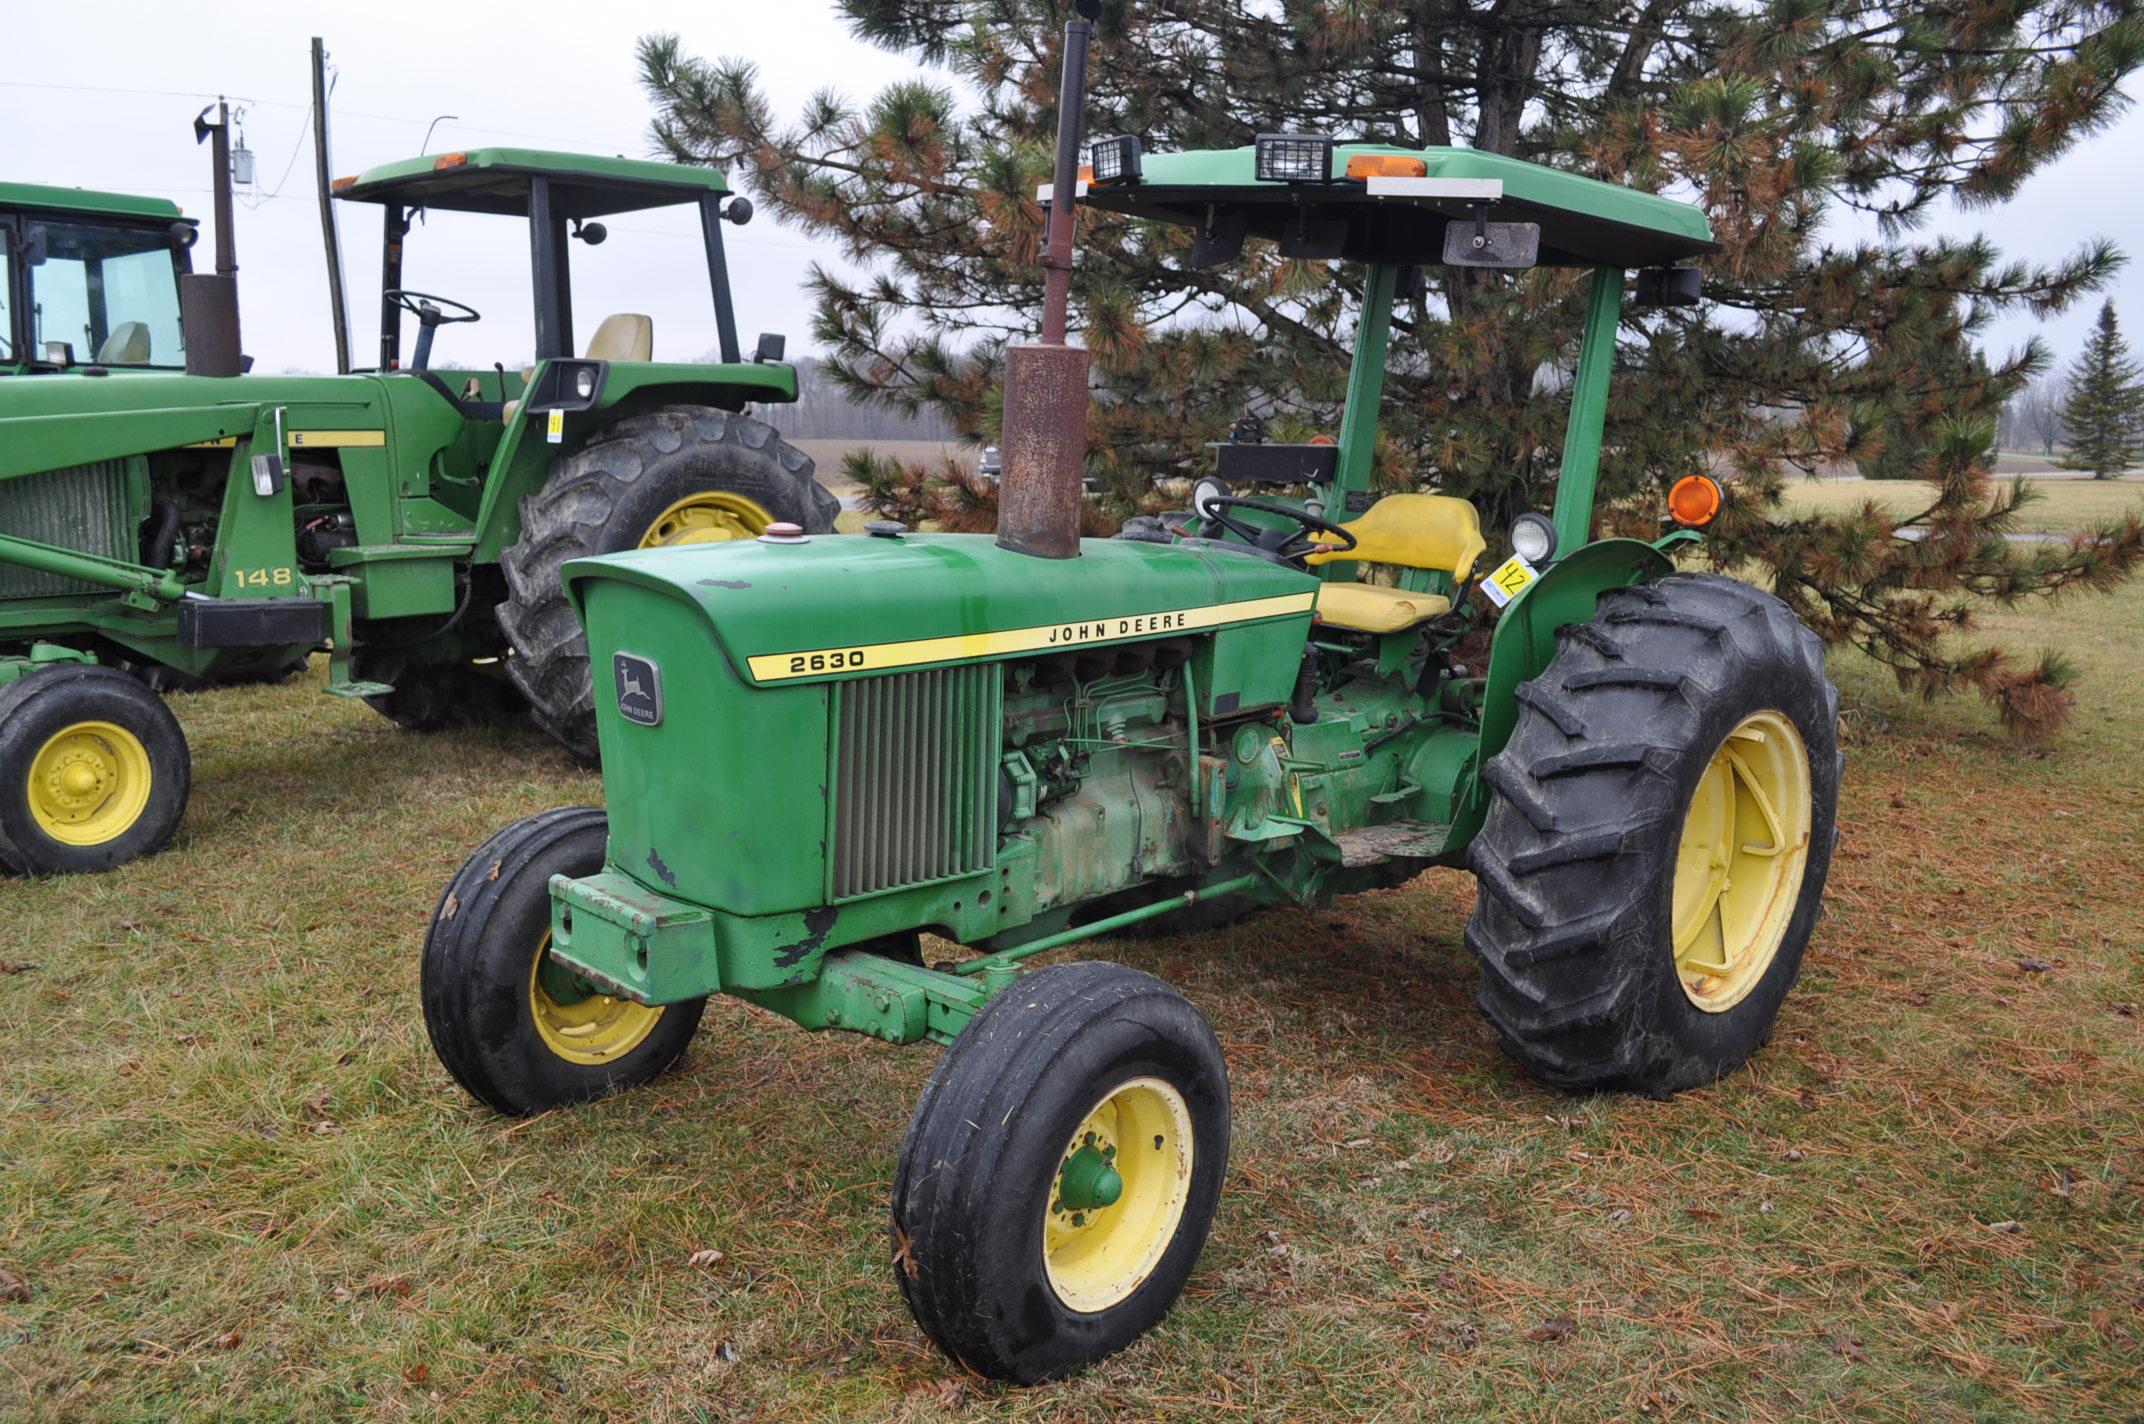 John Deere 2630 tractor, diesel, 16.9-28 rear, 9.5-15 front, 1 hyd remote, 540 pto, 3 pt, 4260